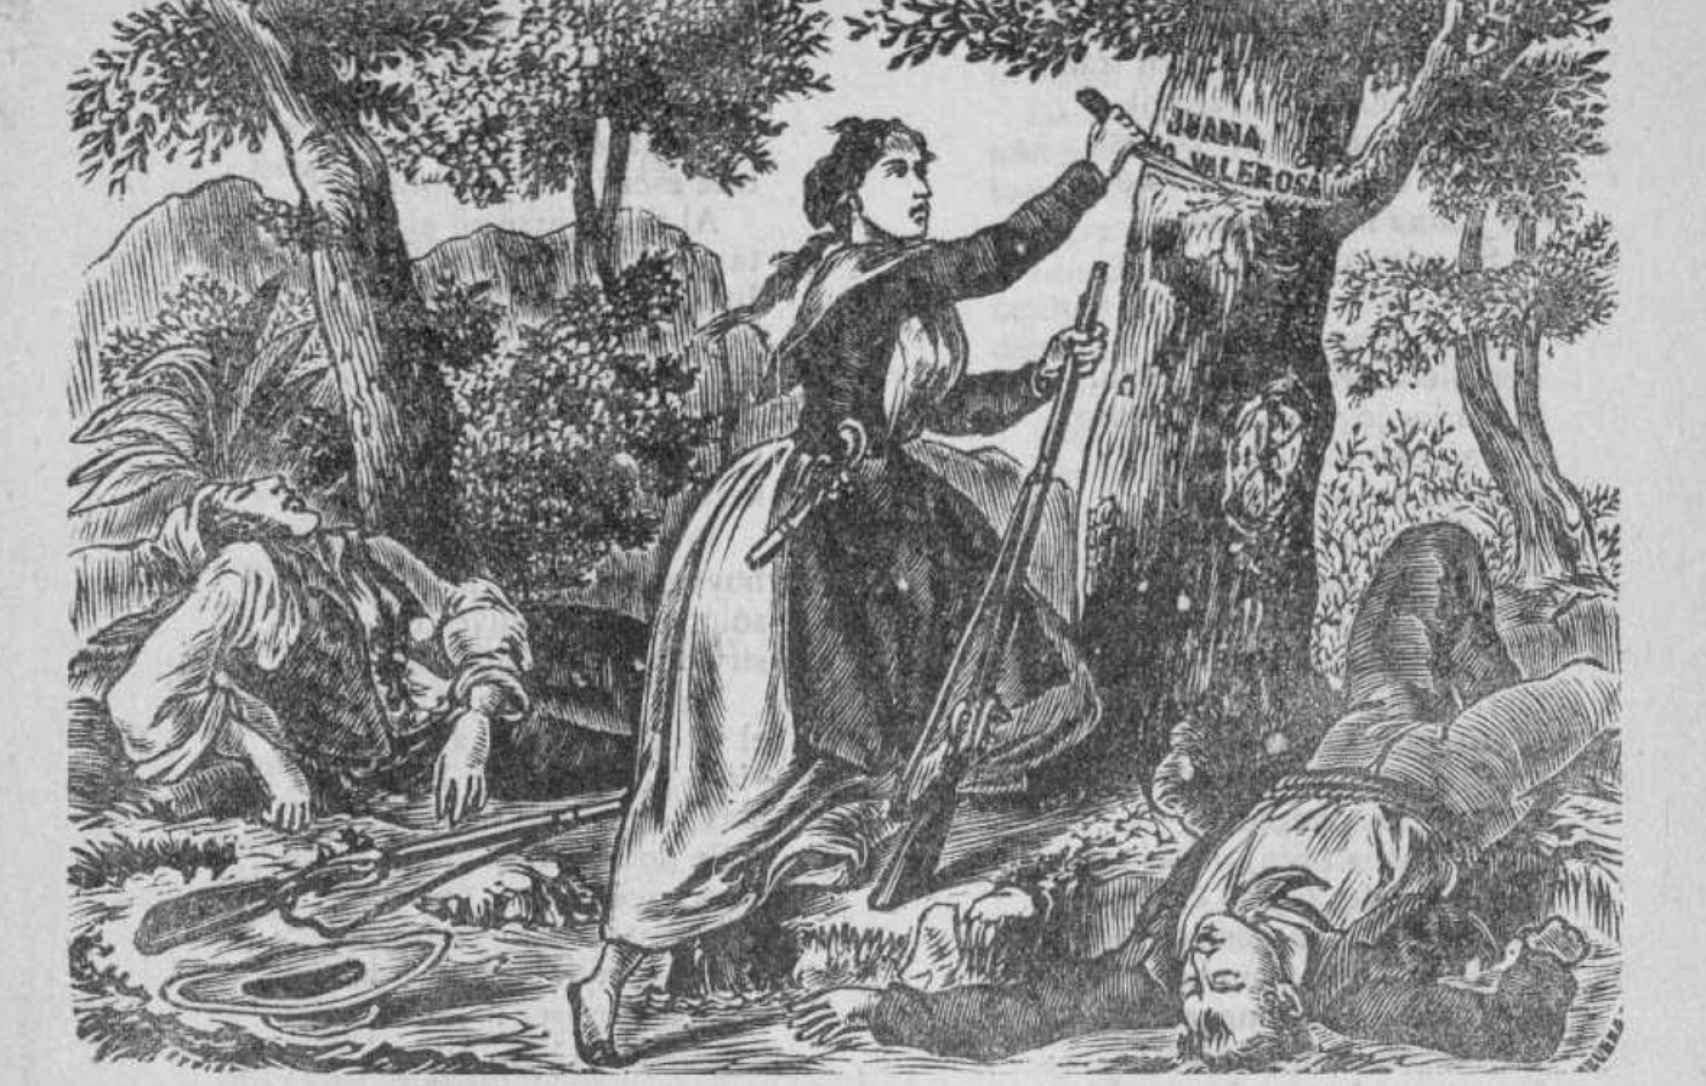 Ilustración de Juana La Valerosa.